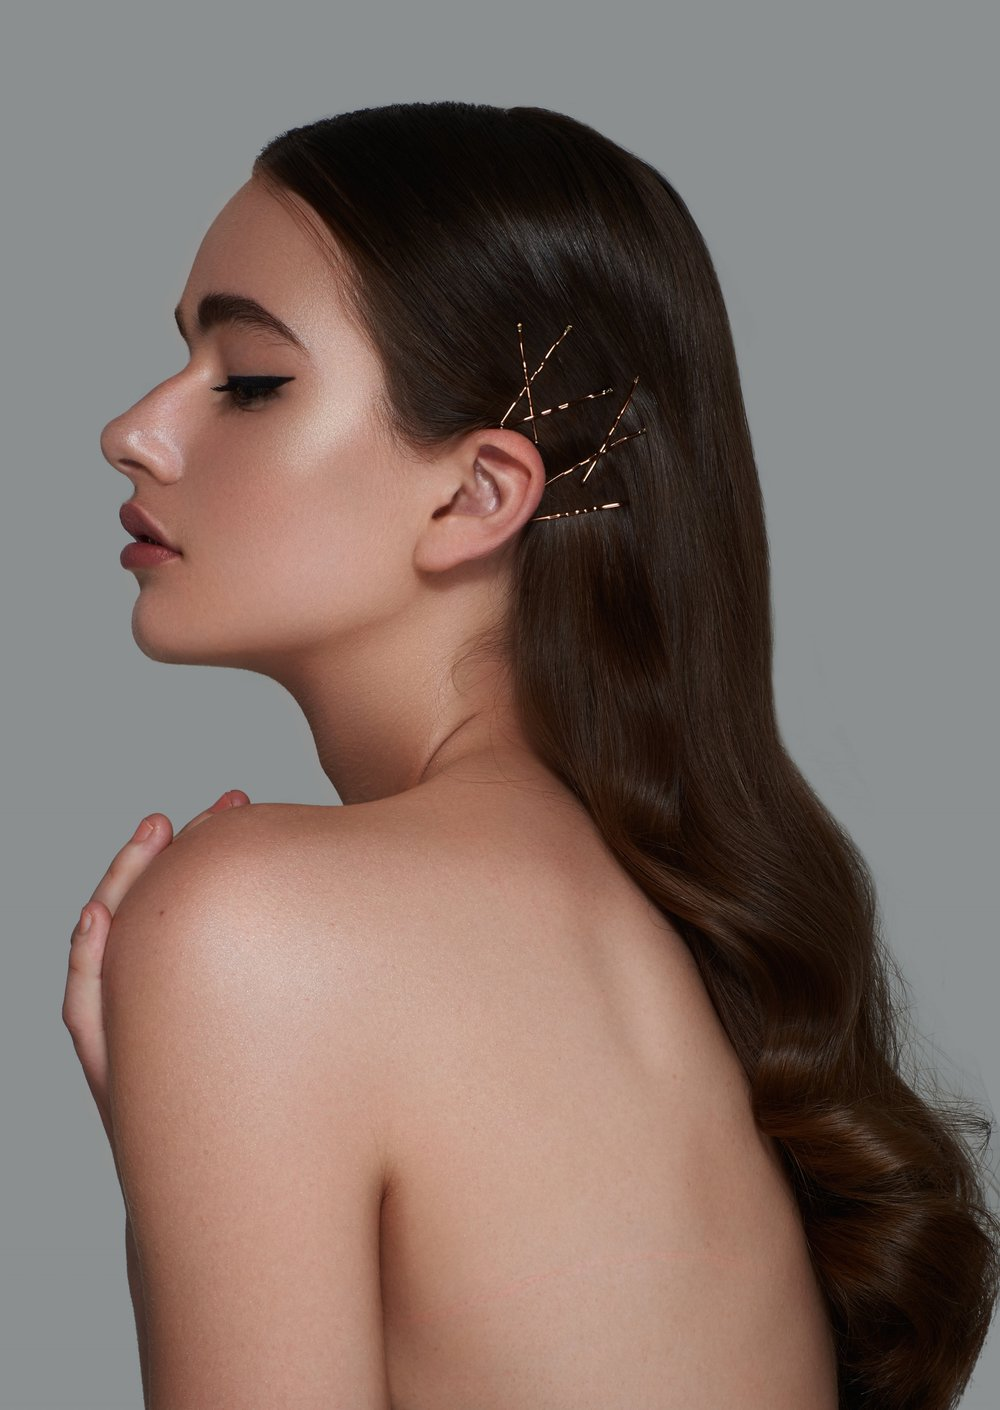 Photography by Taryn rae-lee. Hair Kristine Cimbule